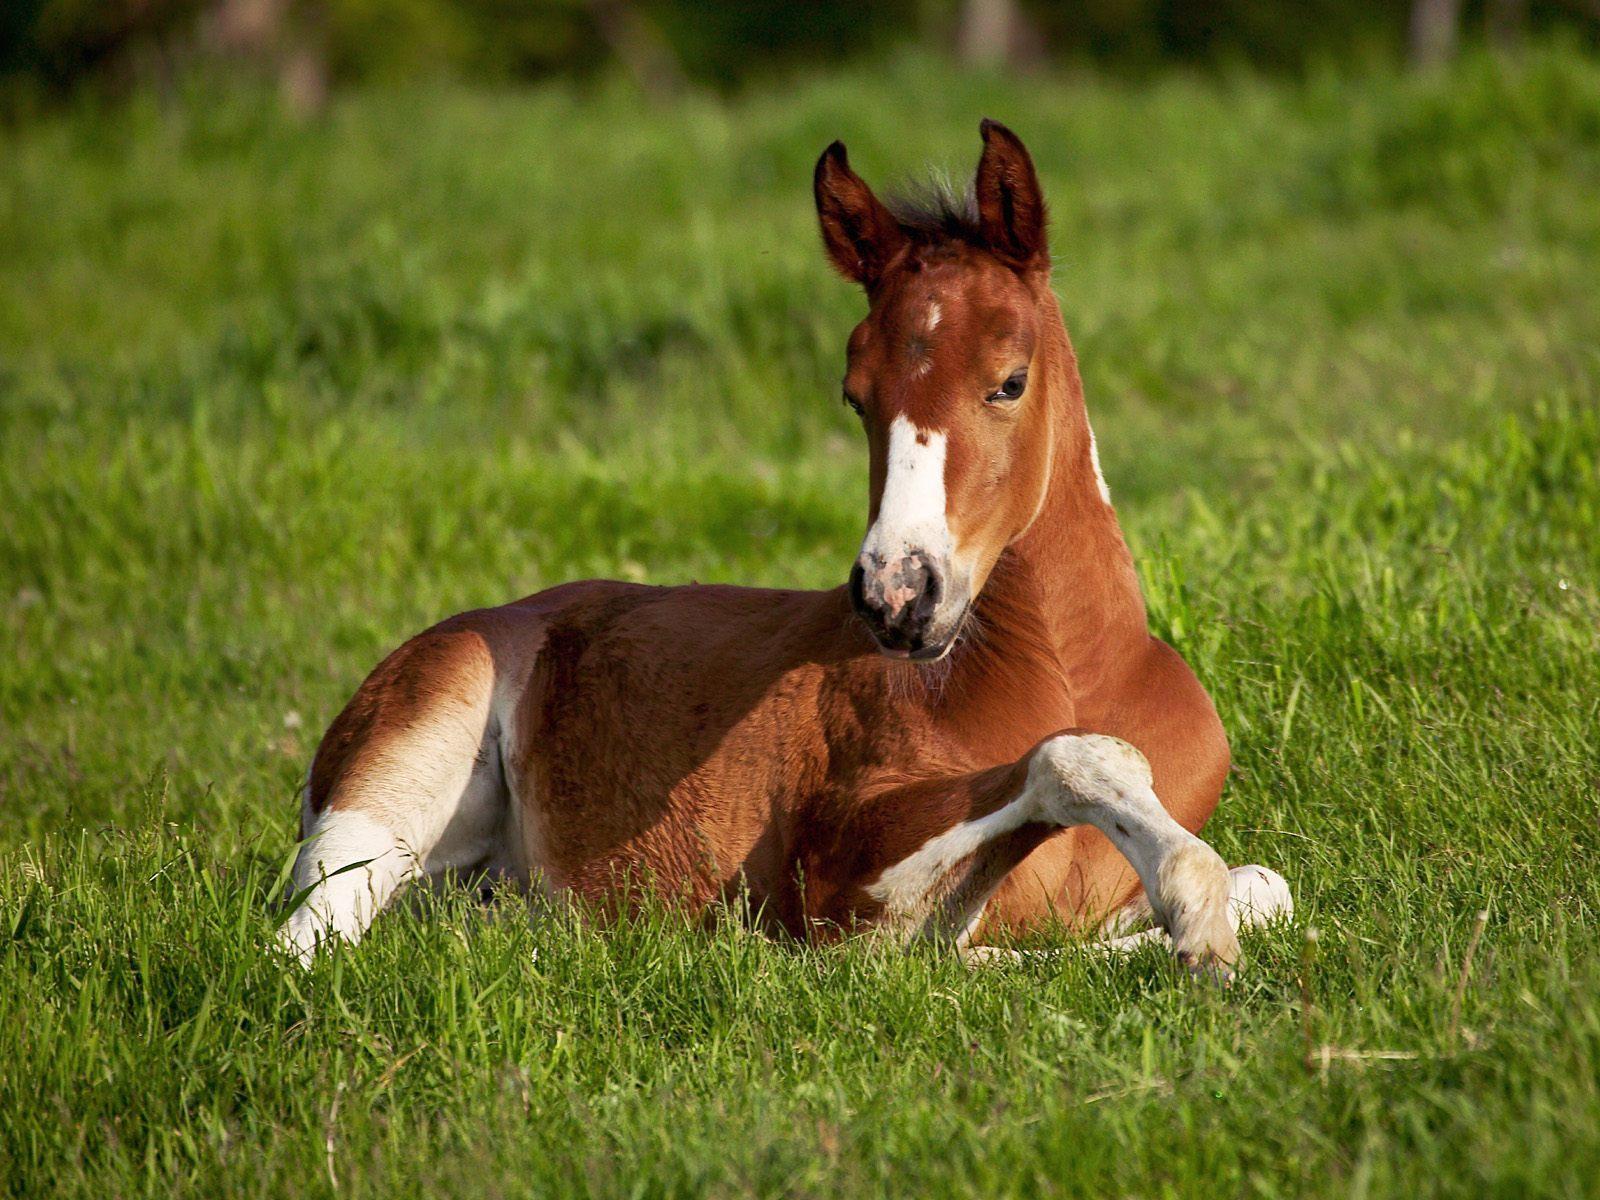 Cute foal clipart.